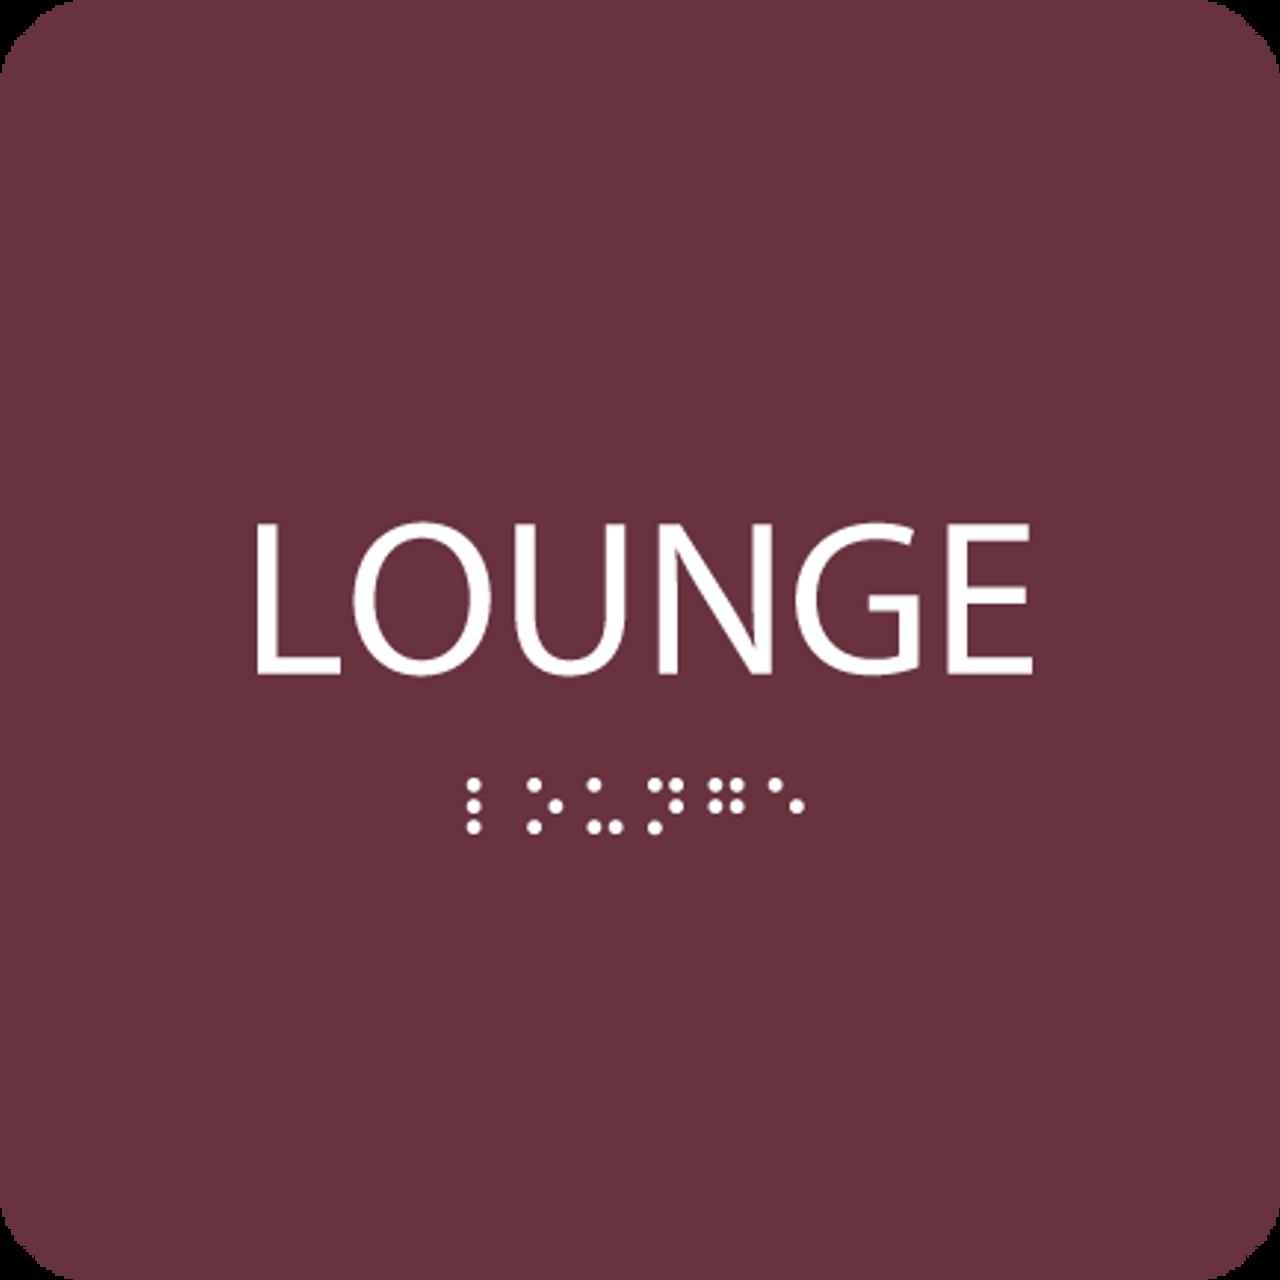 Burgundy Lounge ADA Sign